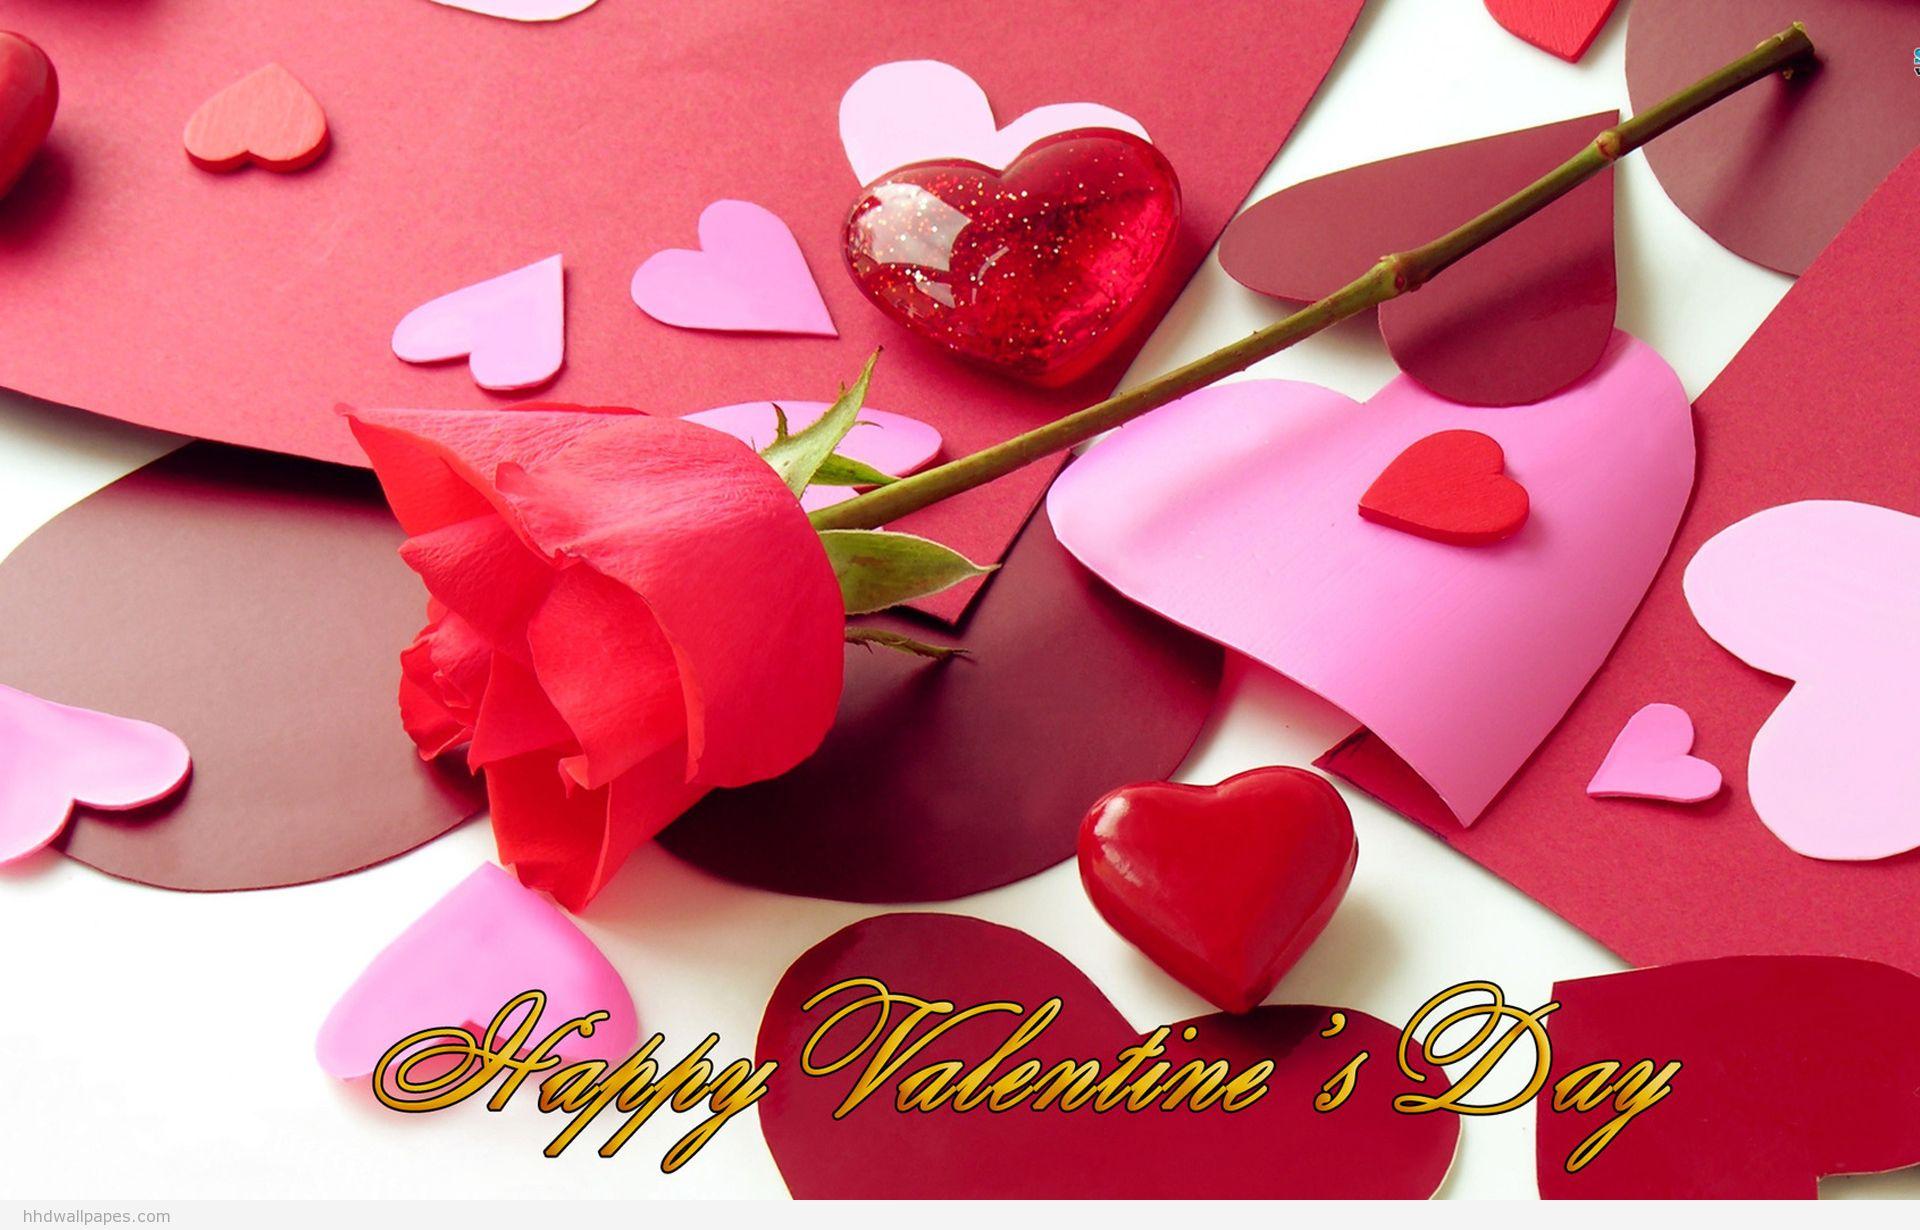 happy valentines day rose bud wallpaper hd